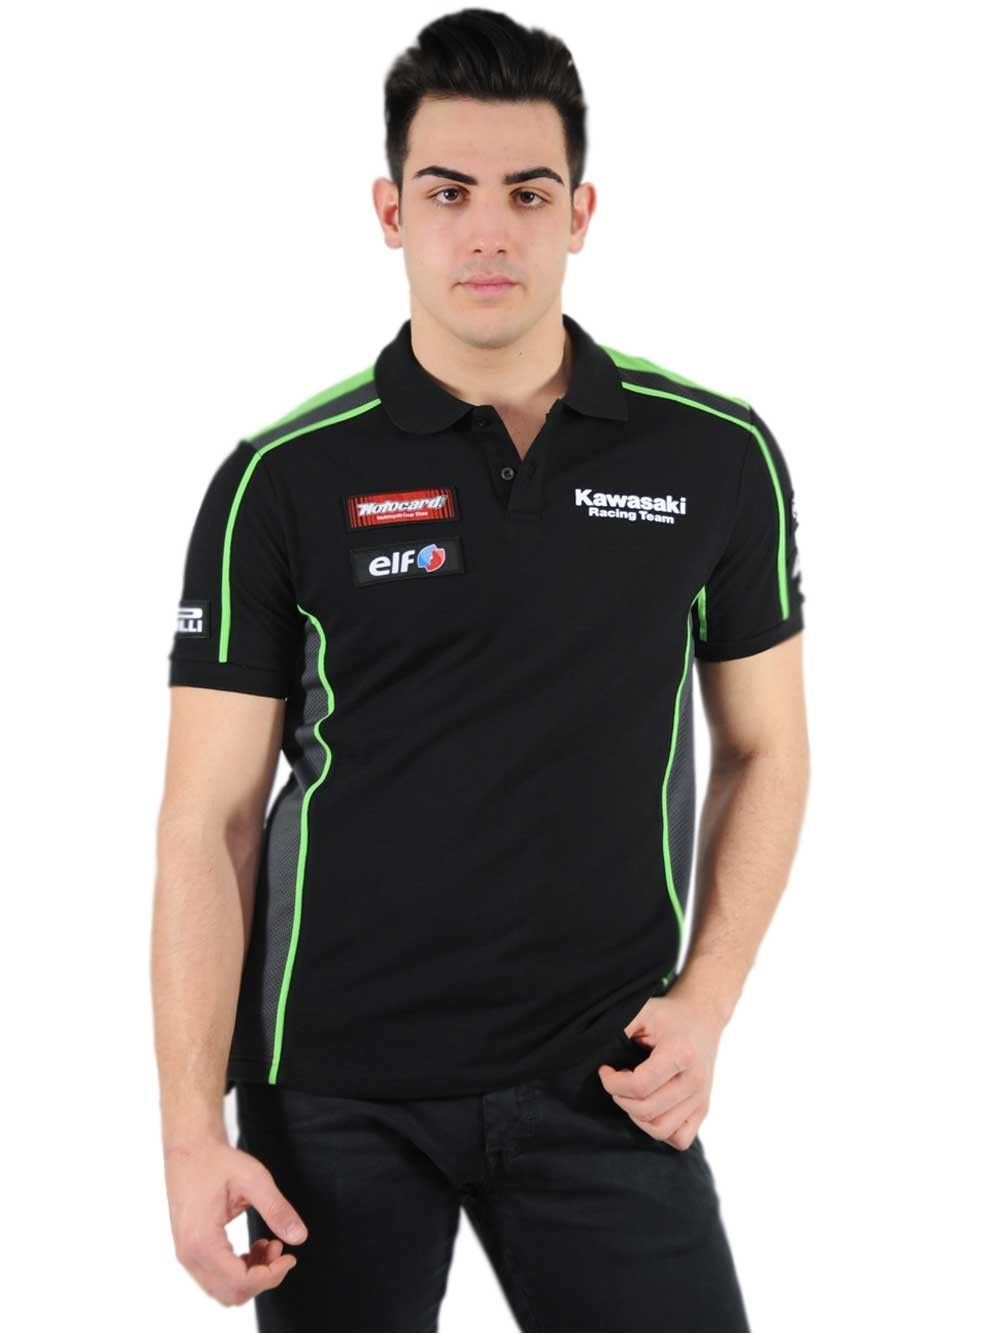 2017 MOTO GP for Kawasaki Motorcycle Riding Team Racing Men's Black Polo Shirt